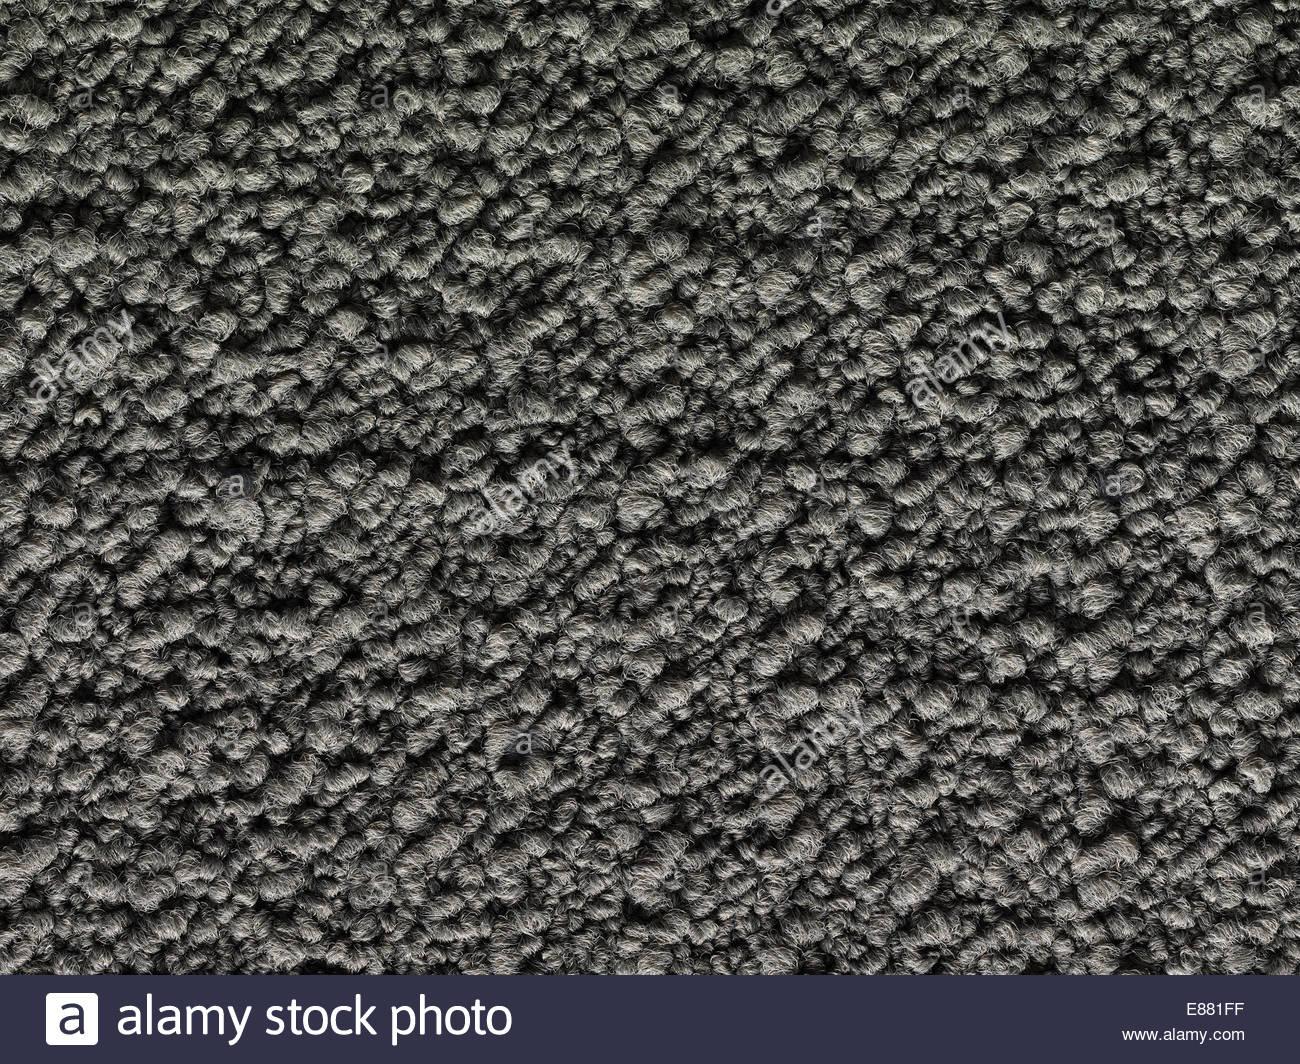 Carpet Texture Berber Or Commercial Flooring